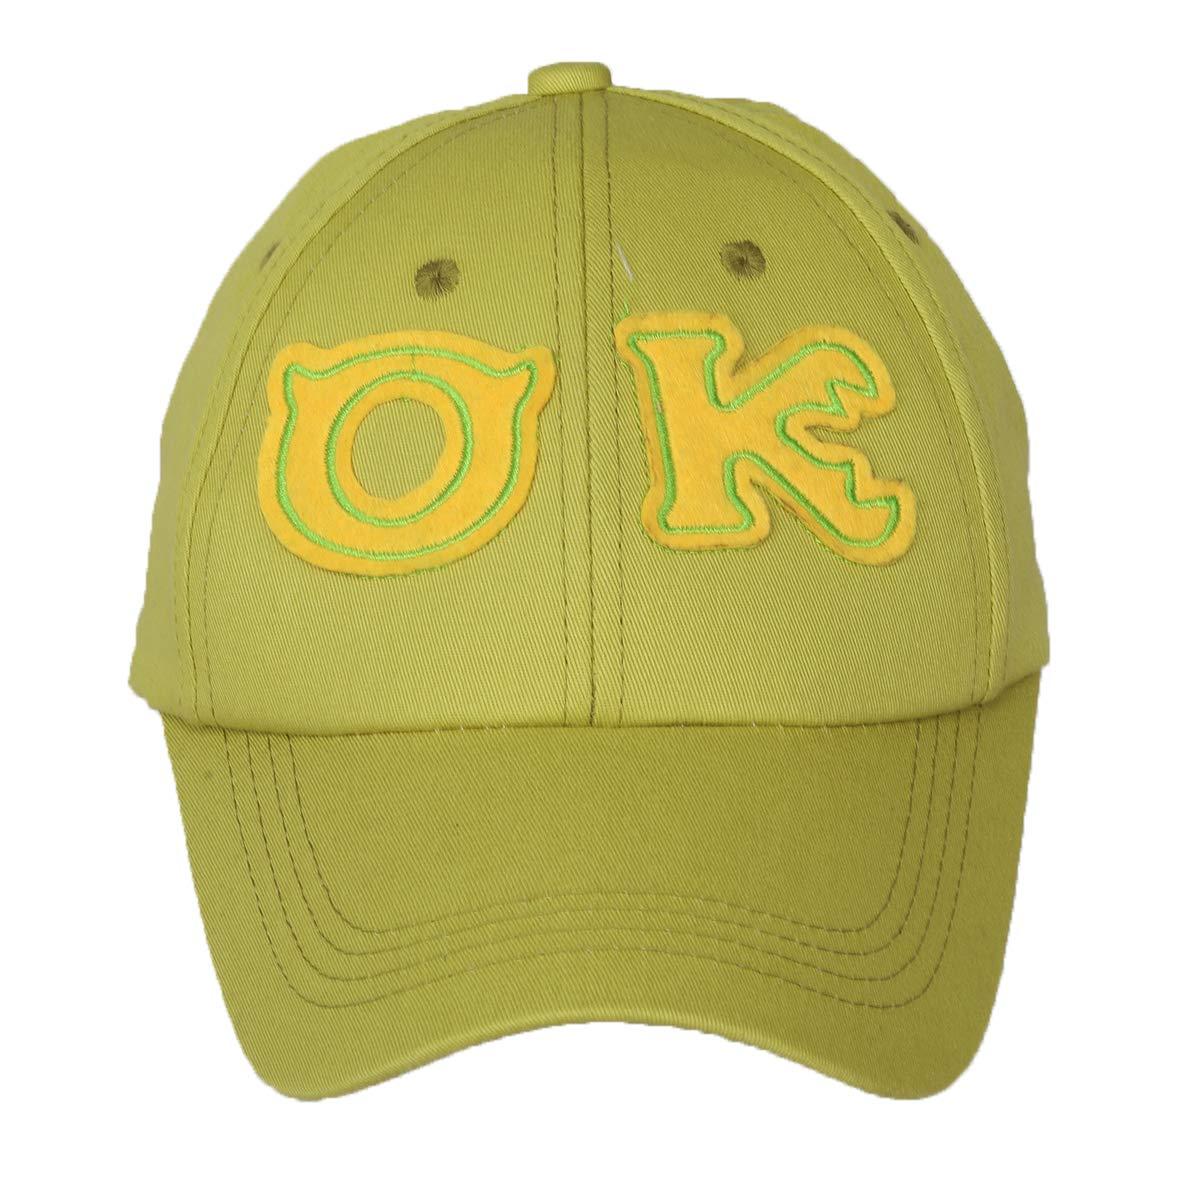 Amazon.com  Mike Wazowski Cap Monsters University Cosplay Hat Oozma Kappa  Baseball Cap for Teens  Clothing 717de3a1d767